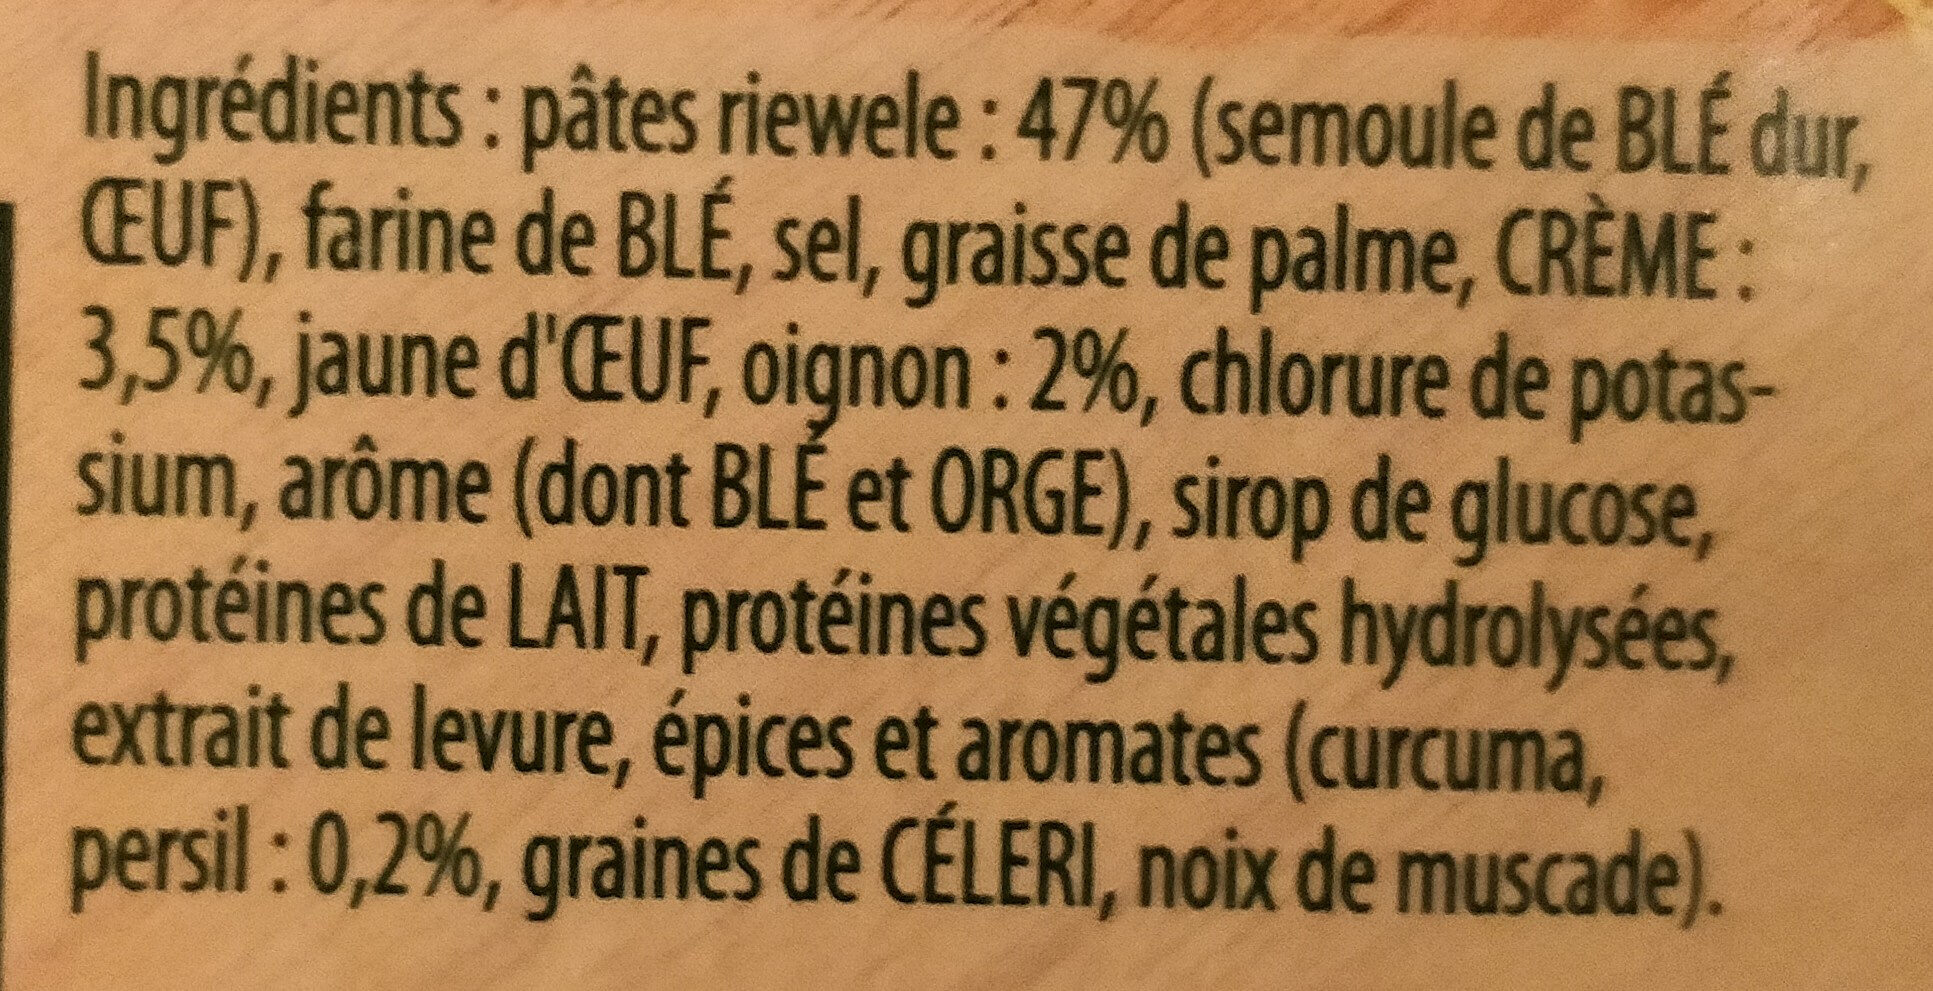 Riewele supp (Soupe à l'alsacienne) - Ingrediënten